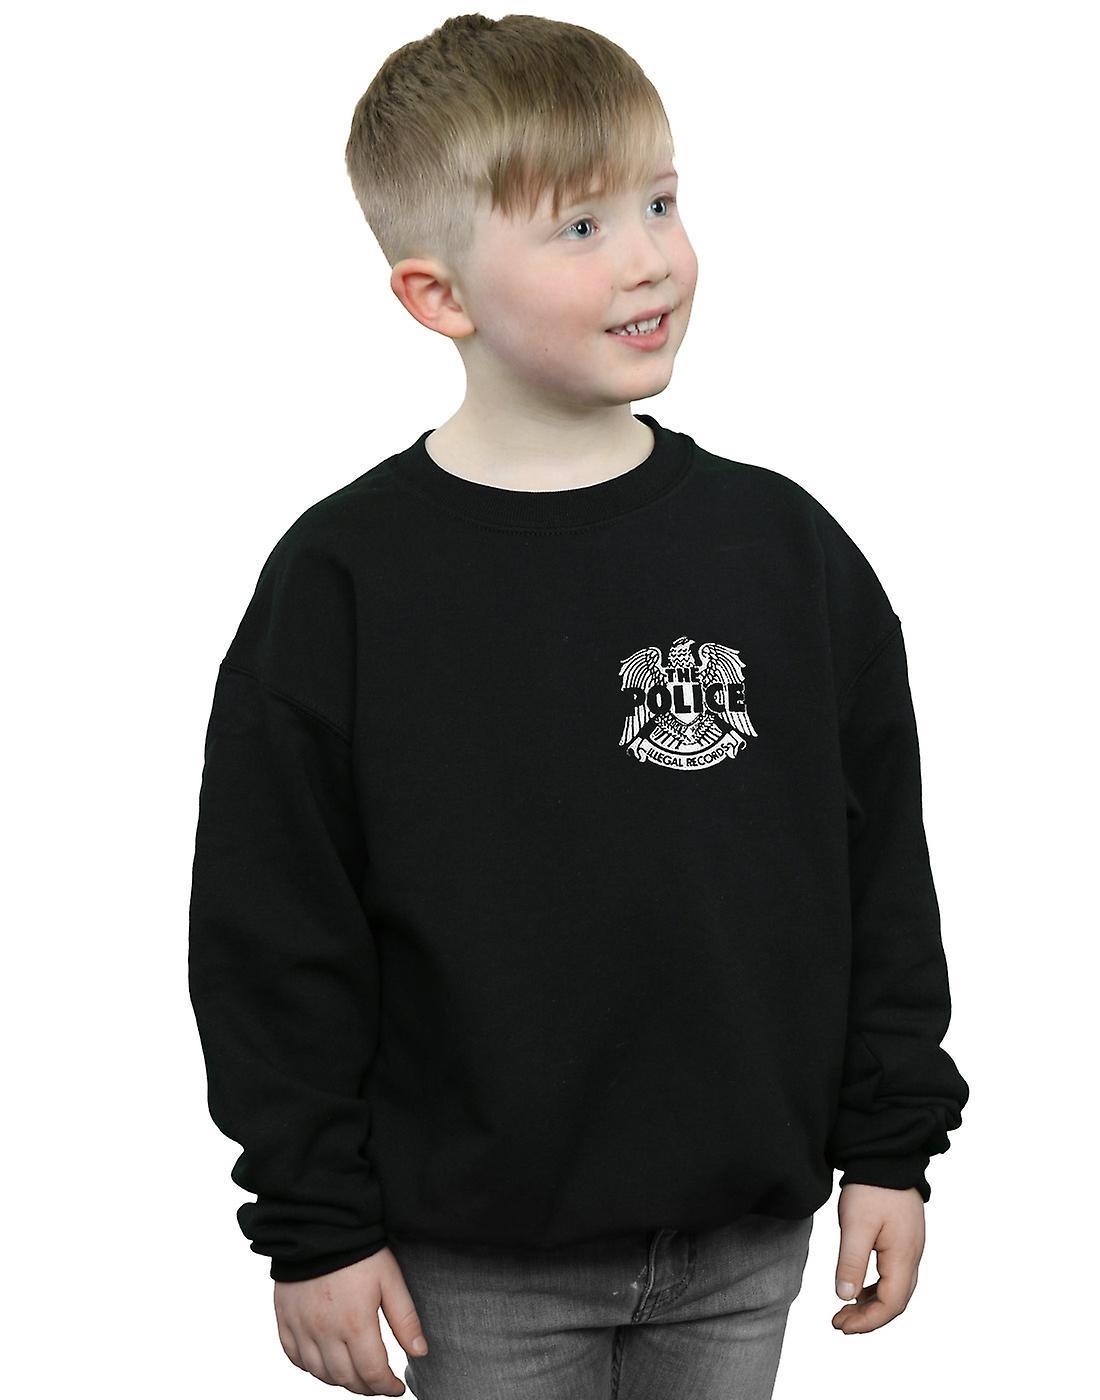 La Police Boys Records illégale Eagle poitrine Sweatshirt